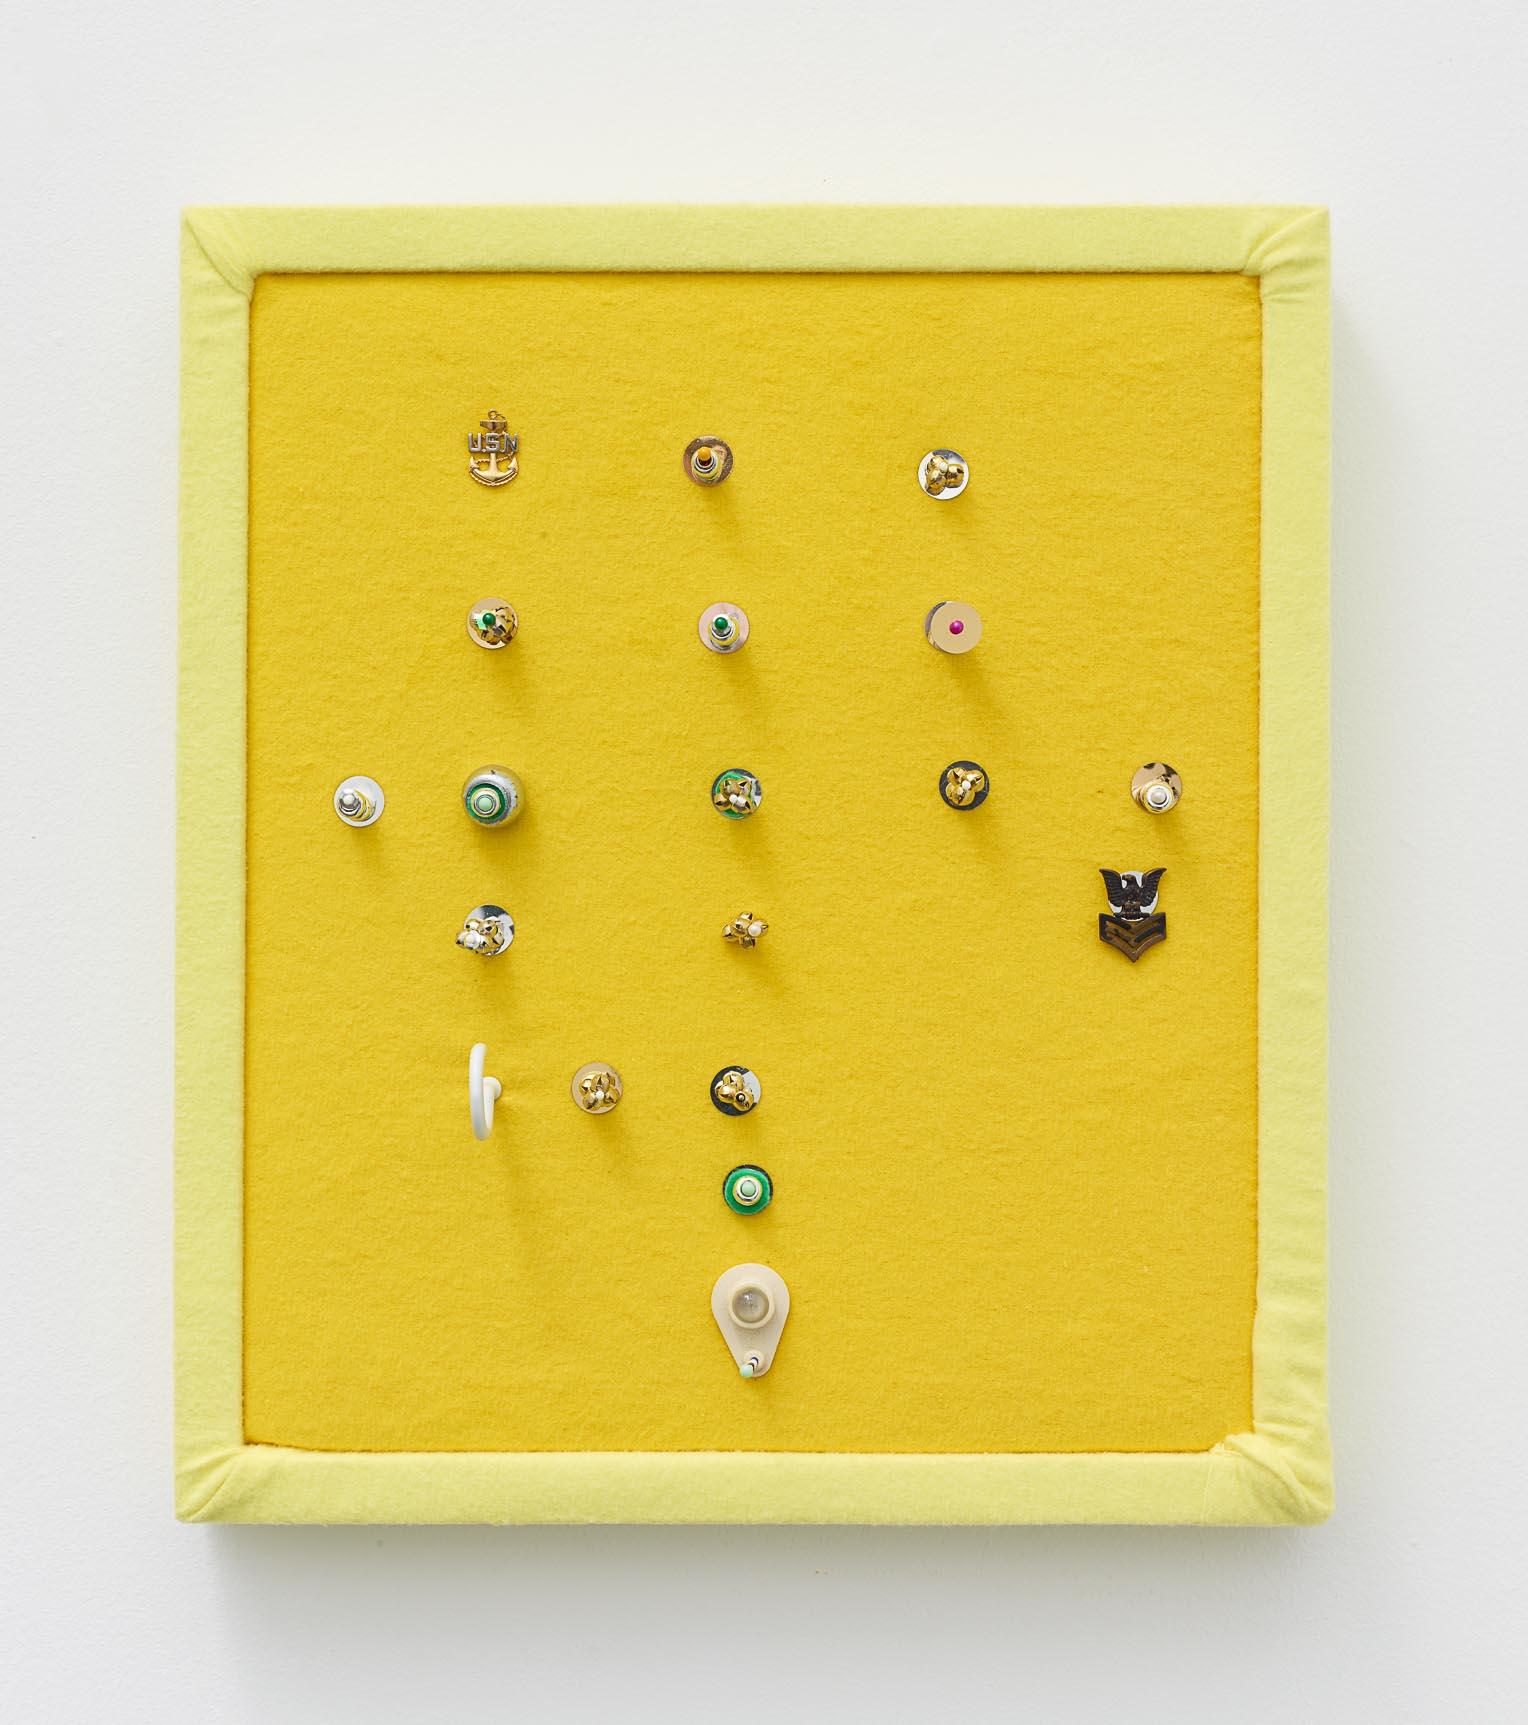 Brock Enright, Lemon Code, 2017, Mixed media on felt, 16 x 14 x 2 in.